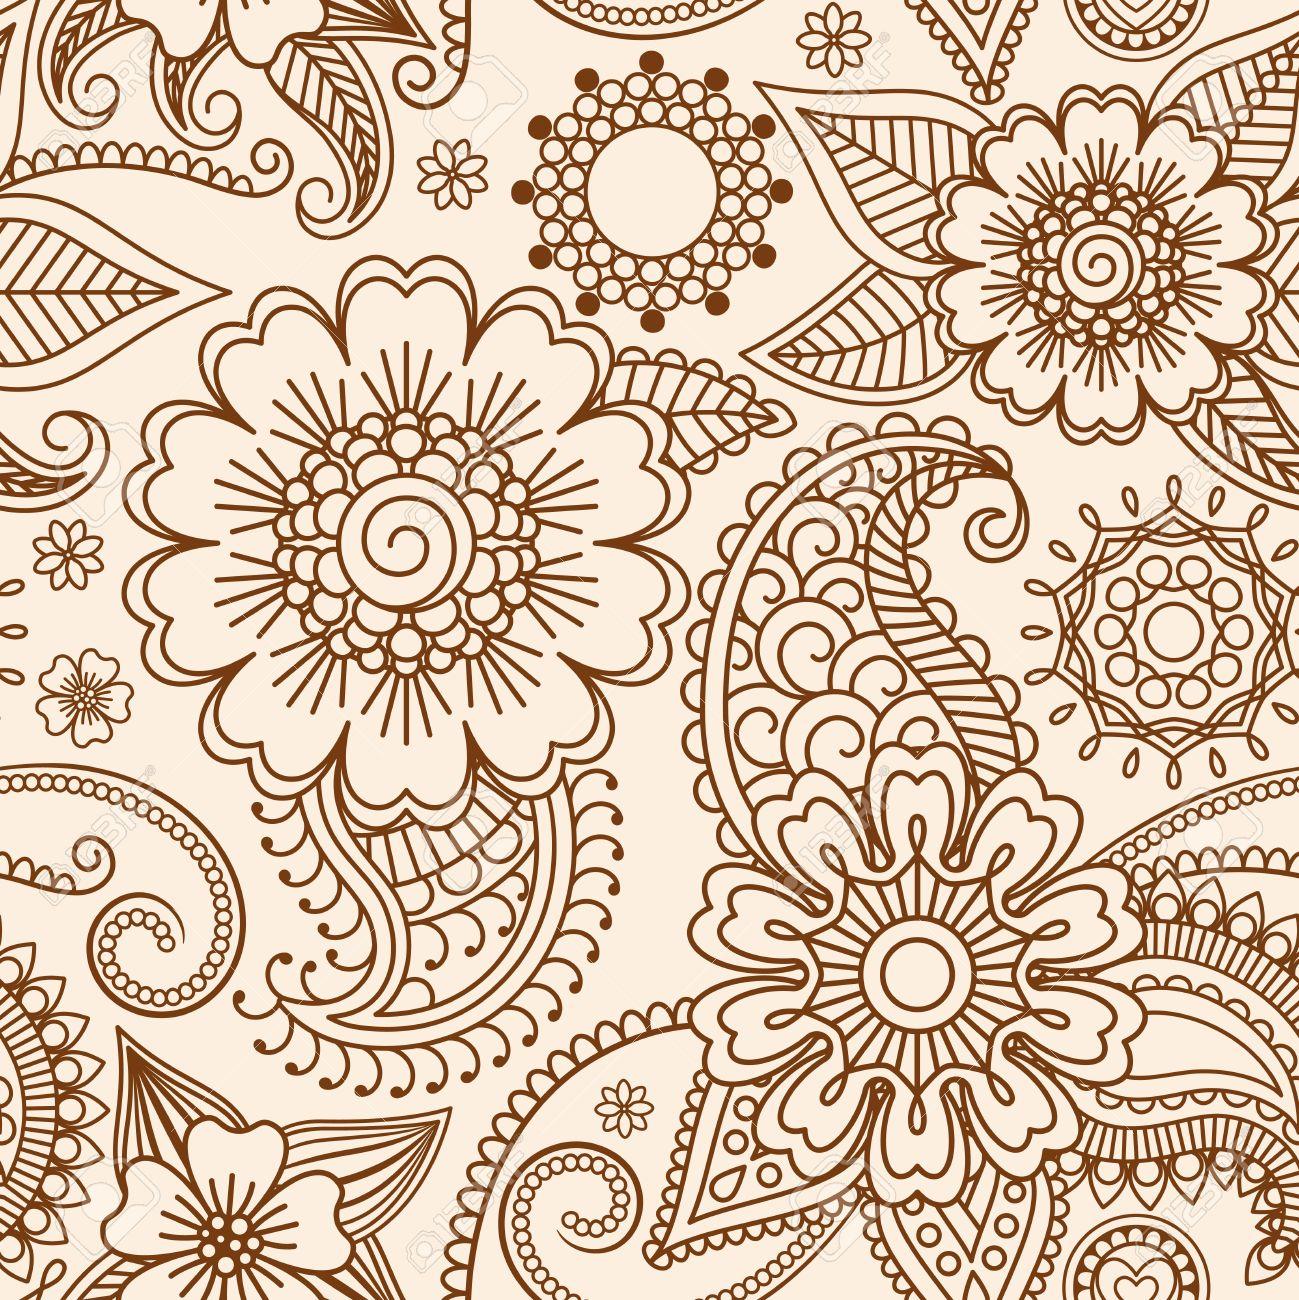 Henna Mehndi Tattoo Doodle Seamless Pattern Background Royalty Free